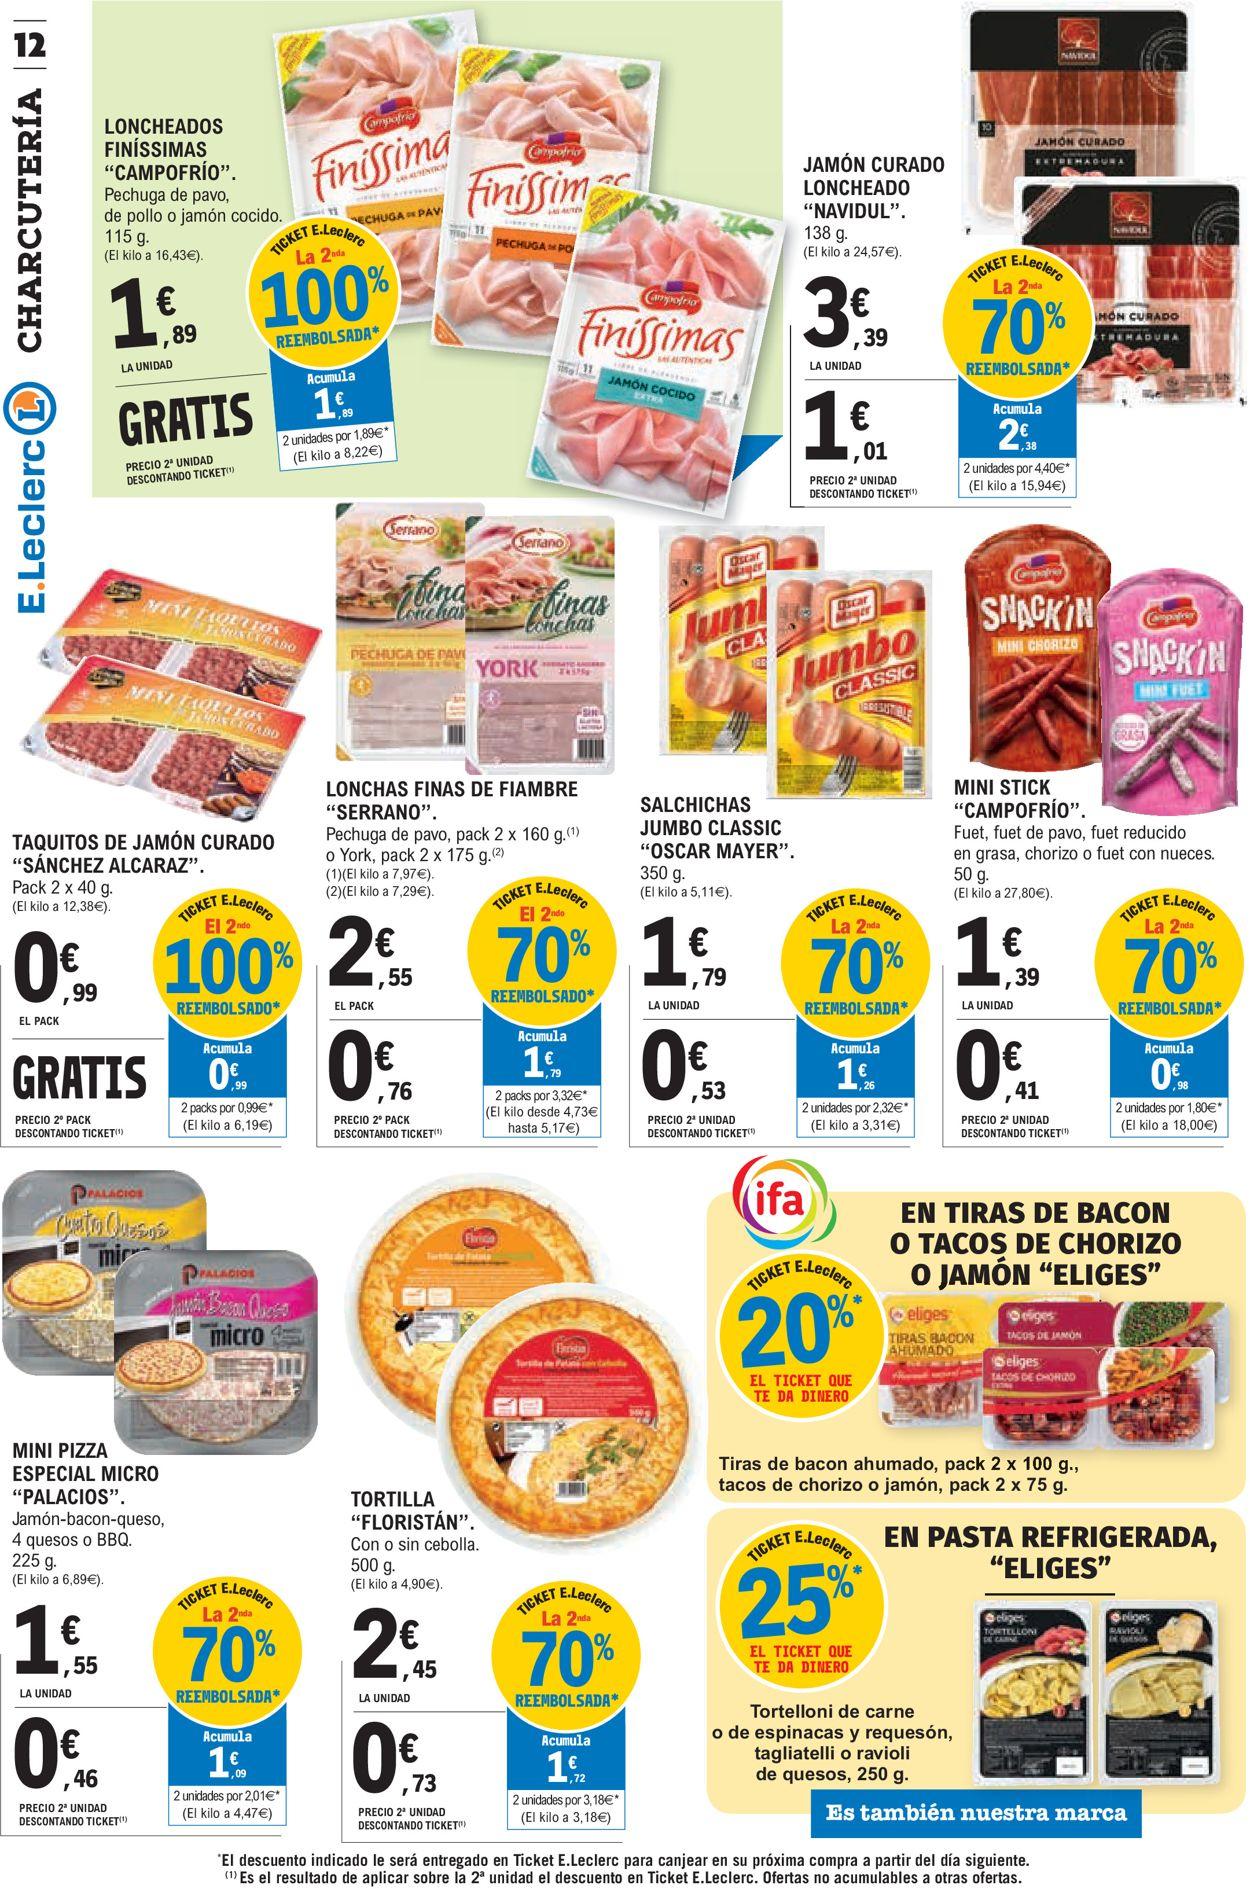 E.leclerc Folleto - 10.06-21.06.2020 (Página 12)